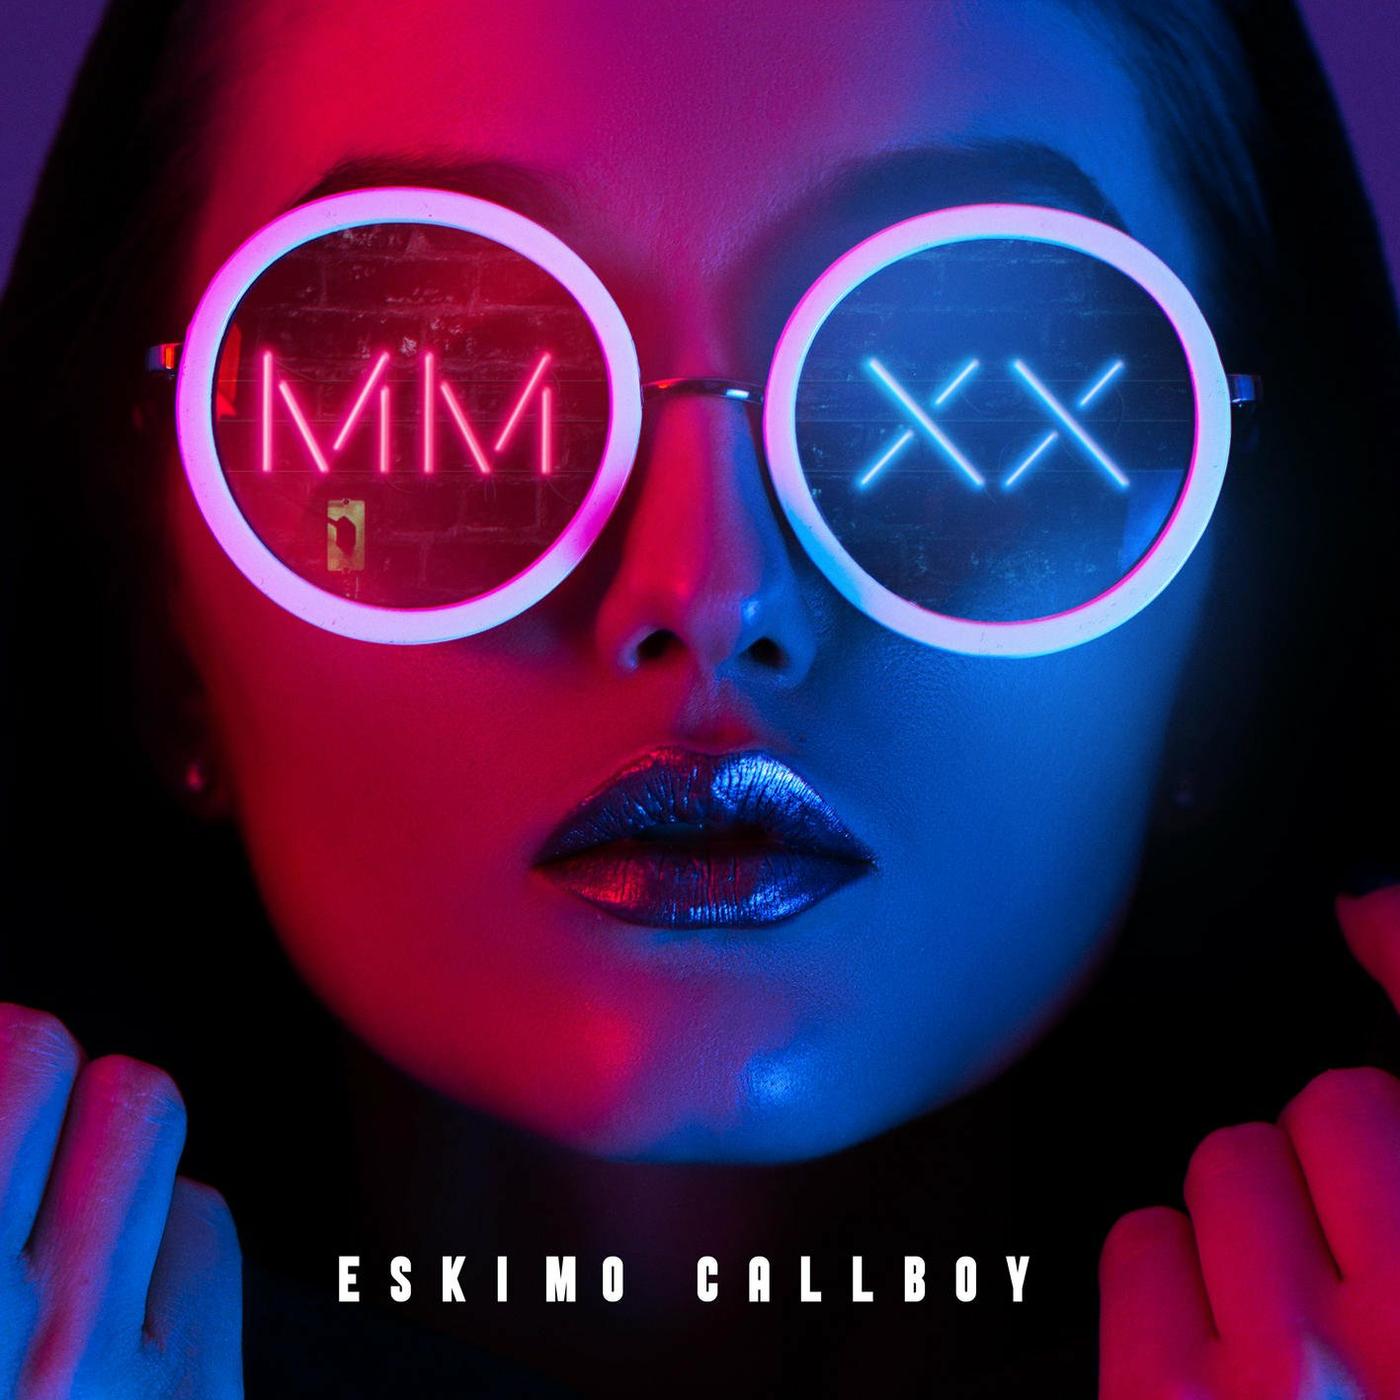 Eskimo Callboy - MMXX [EP] (2020)